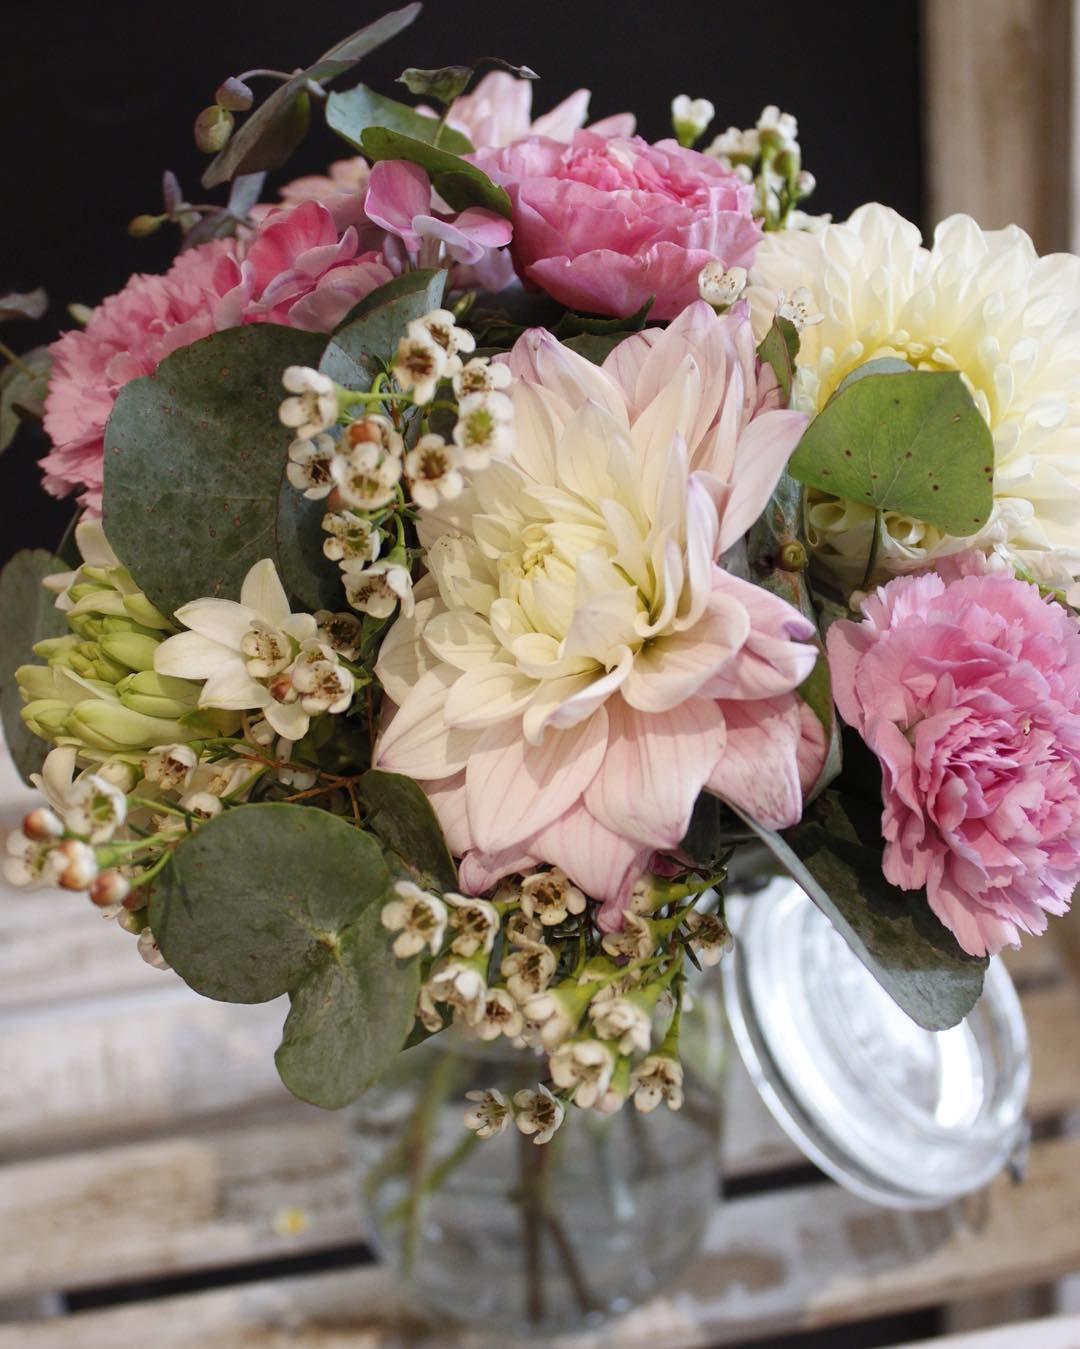 Bouquet Fleurs Instaflower Douceur Sweetness